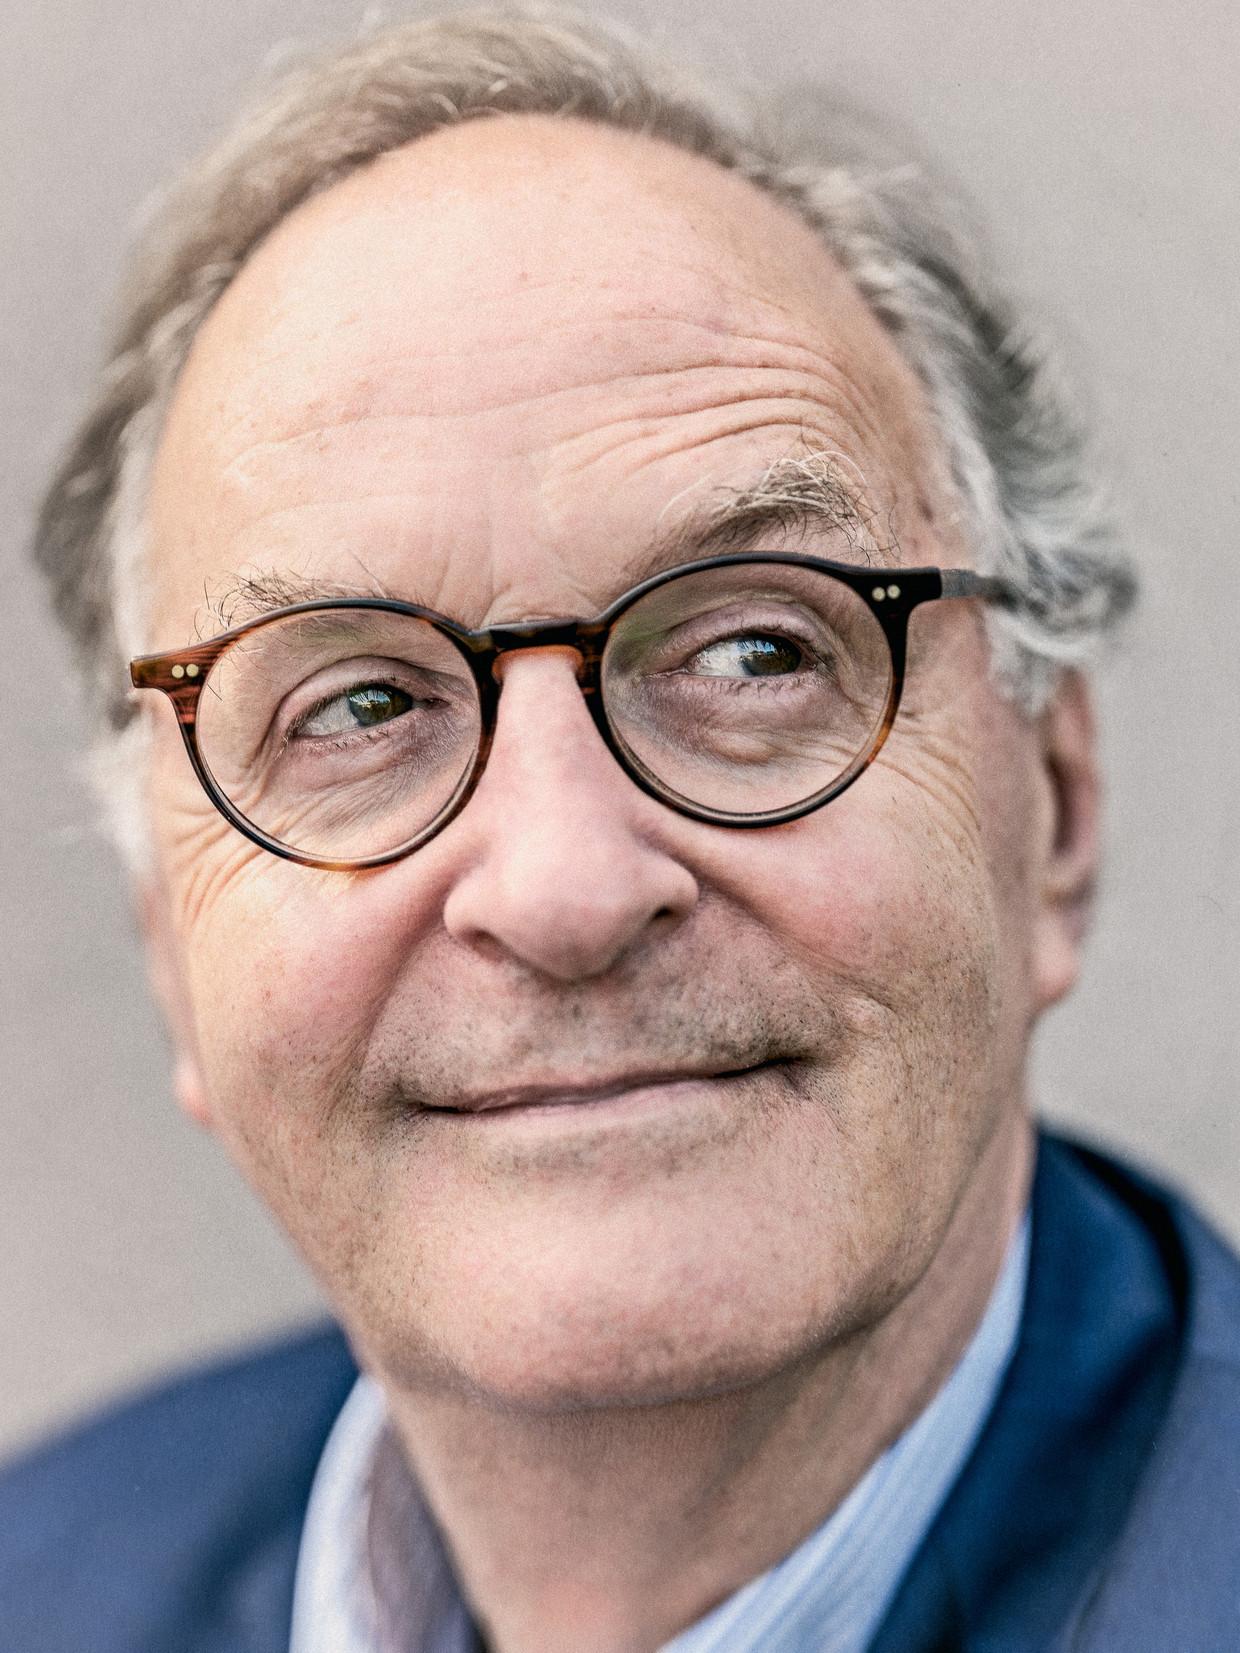 Alexander Rinnooy Kan, voormalig 'invloedrijkste man van Nederland' Beeld Jitske Schols